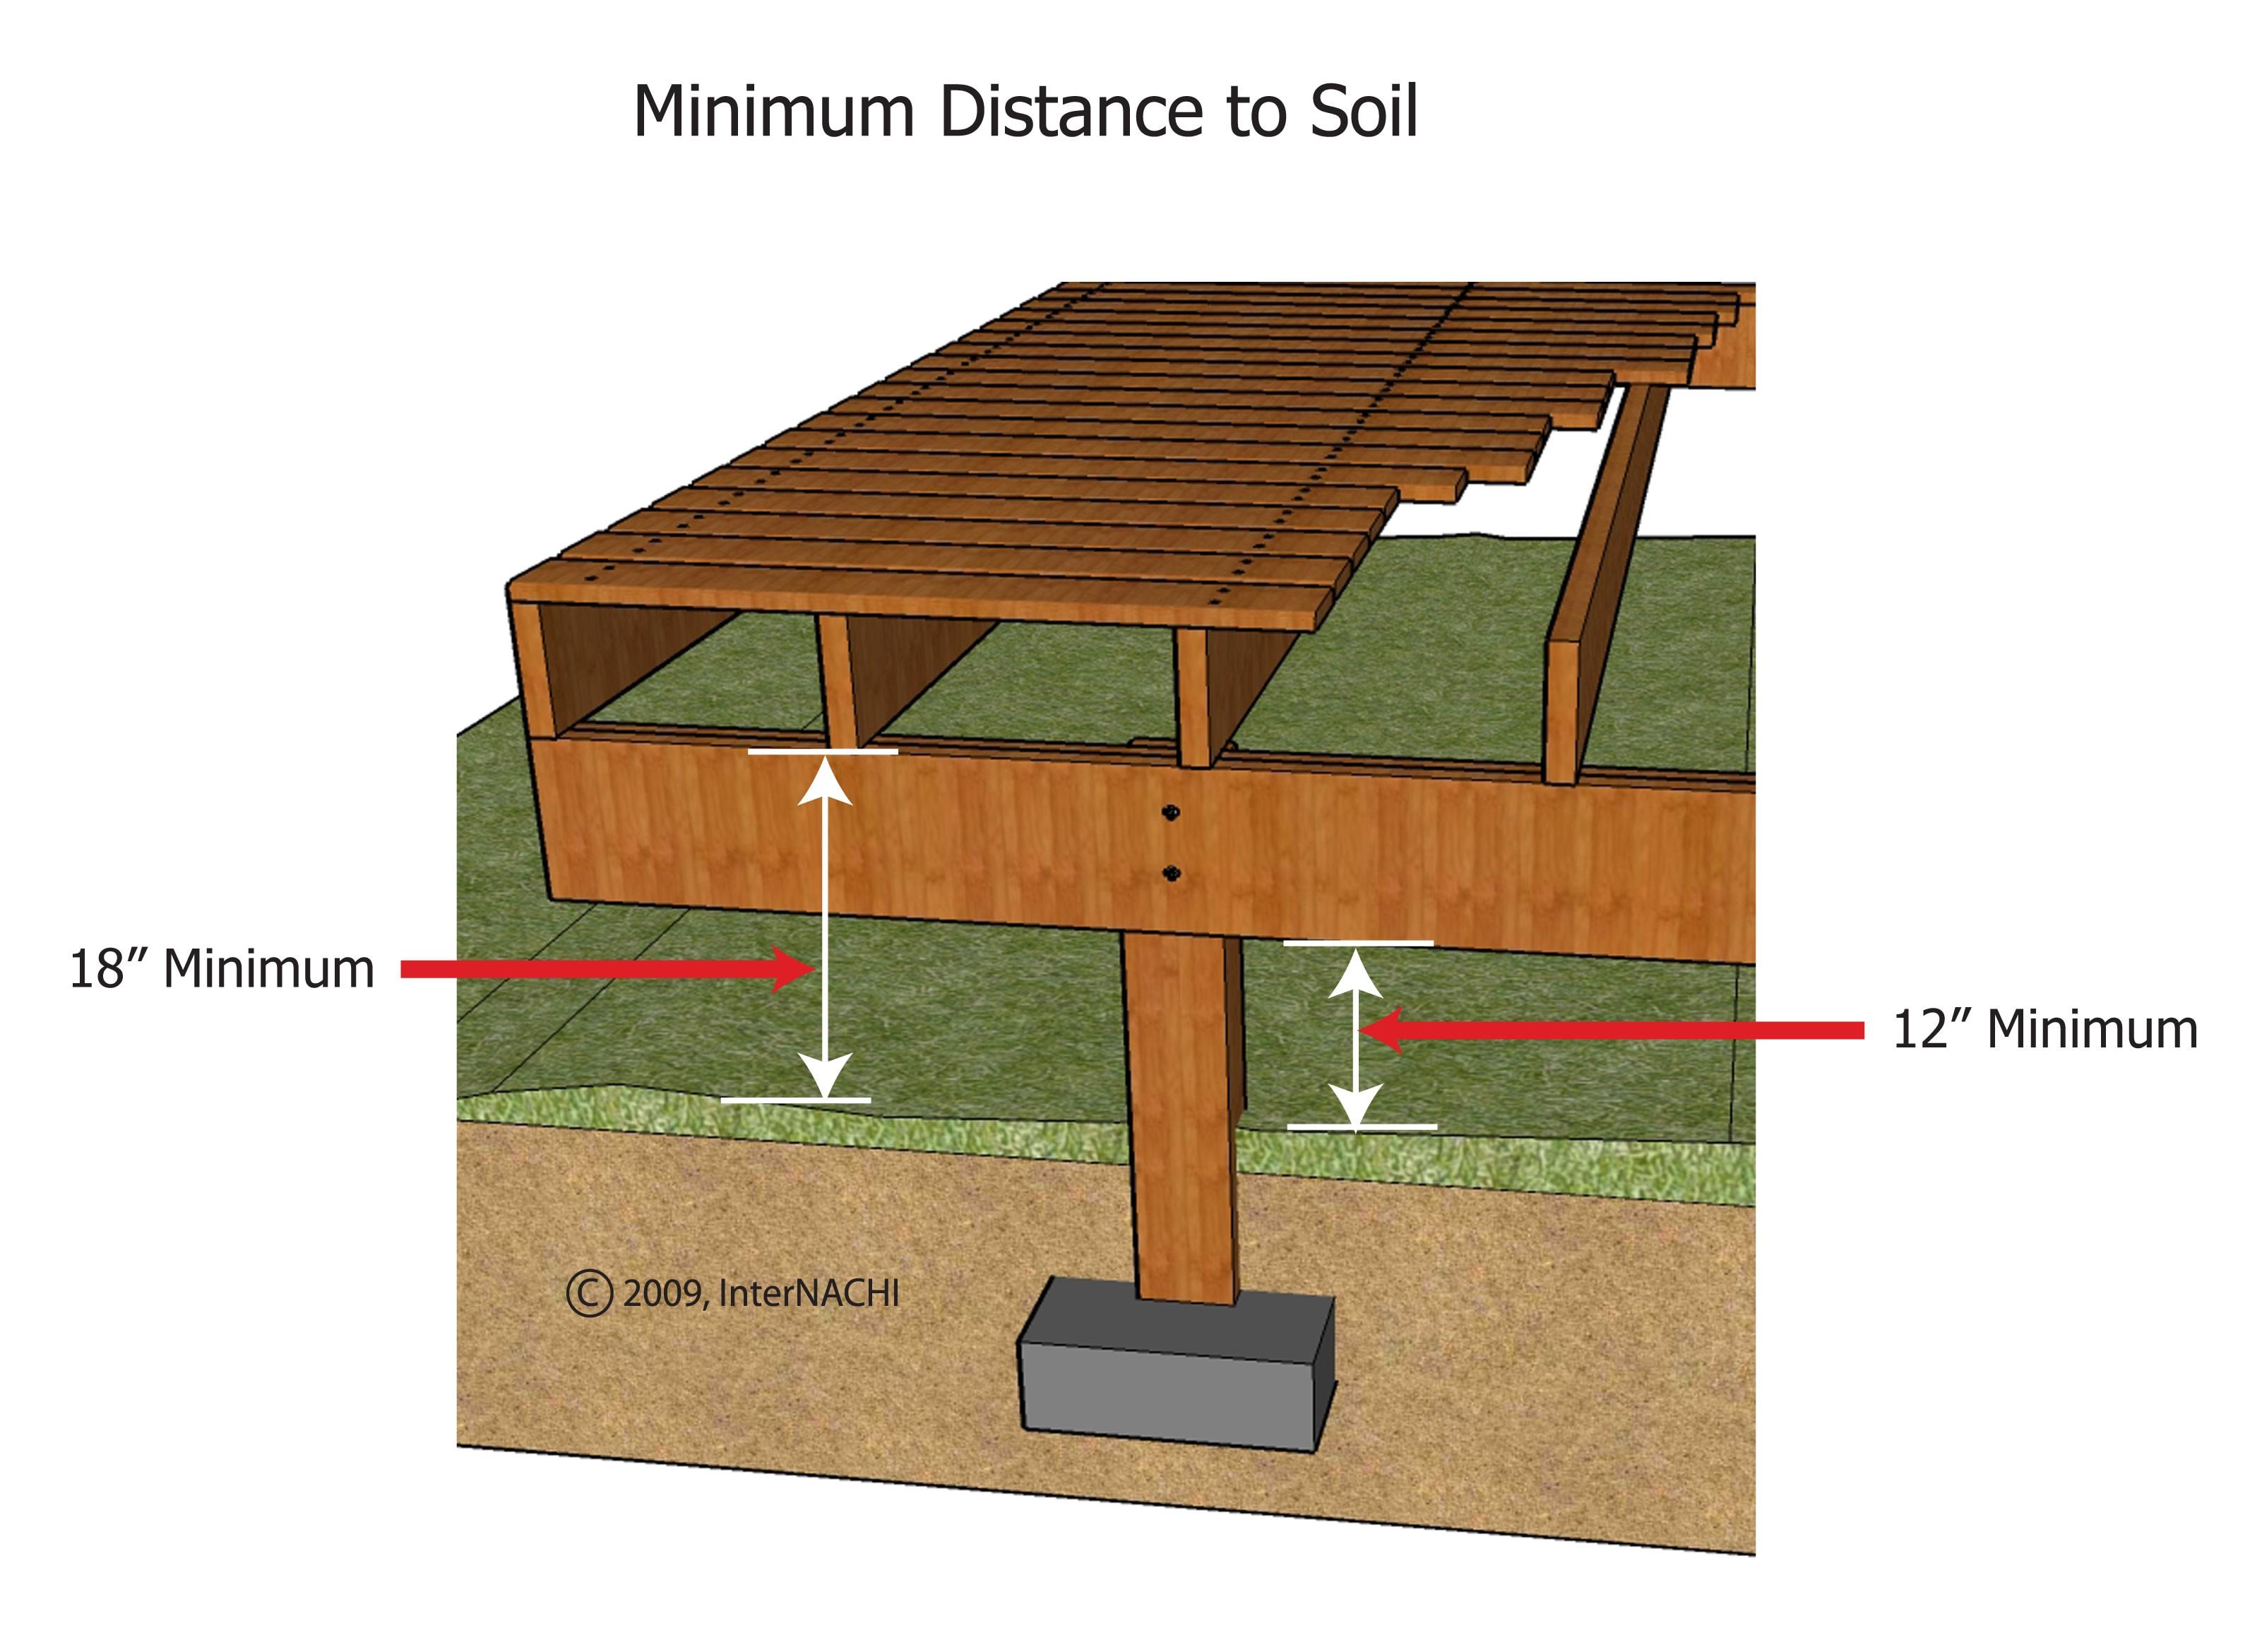 Minimum distance to soil.